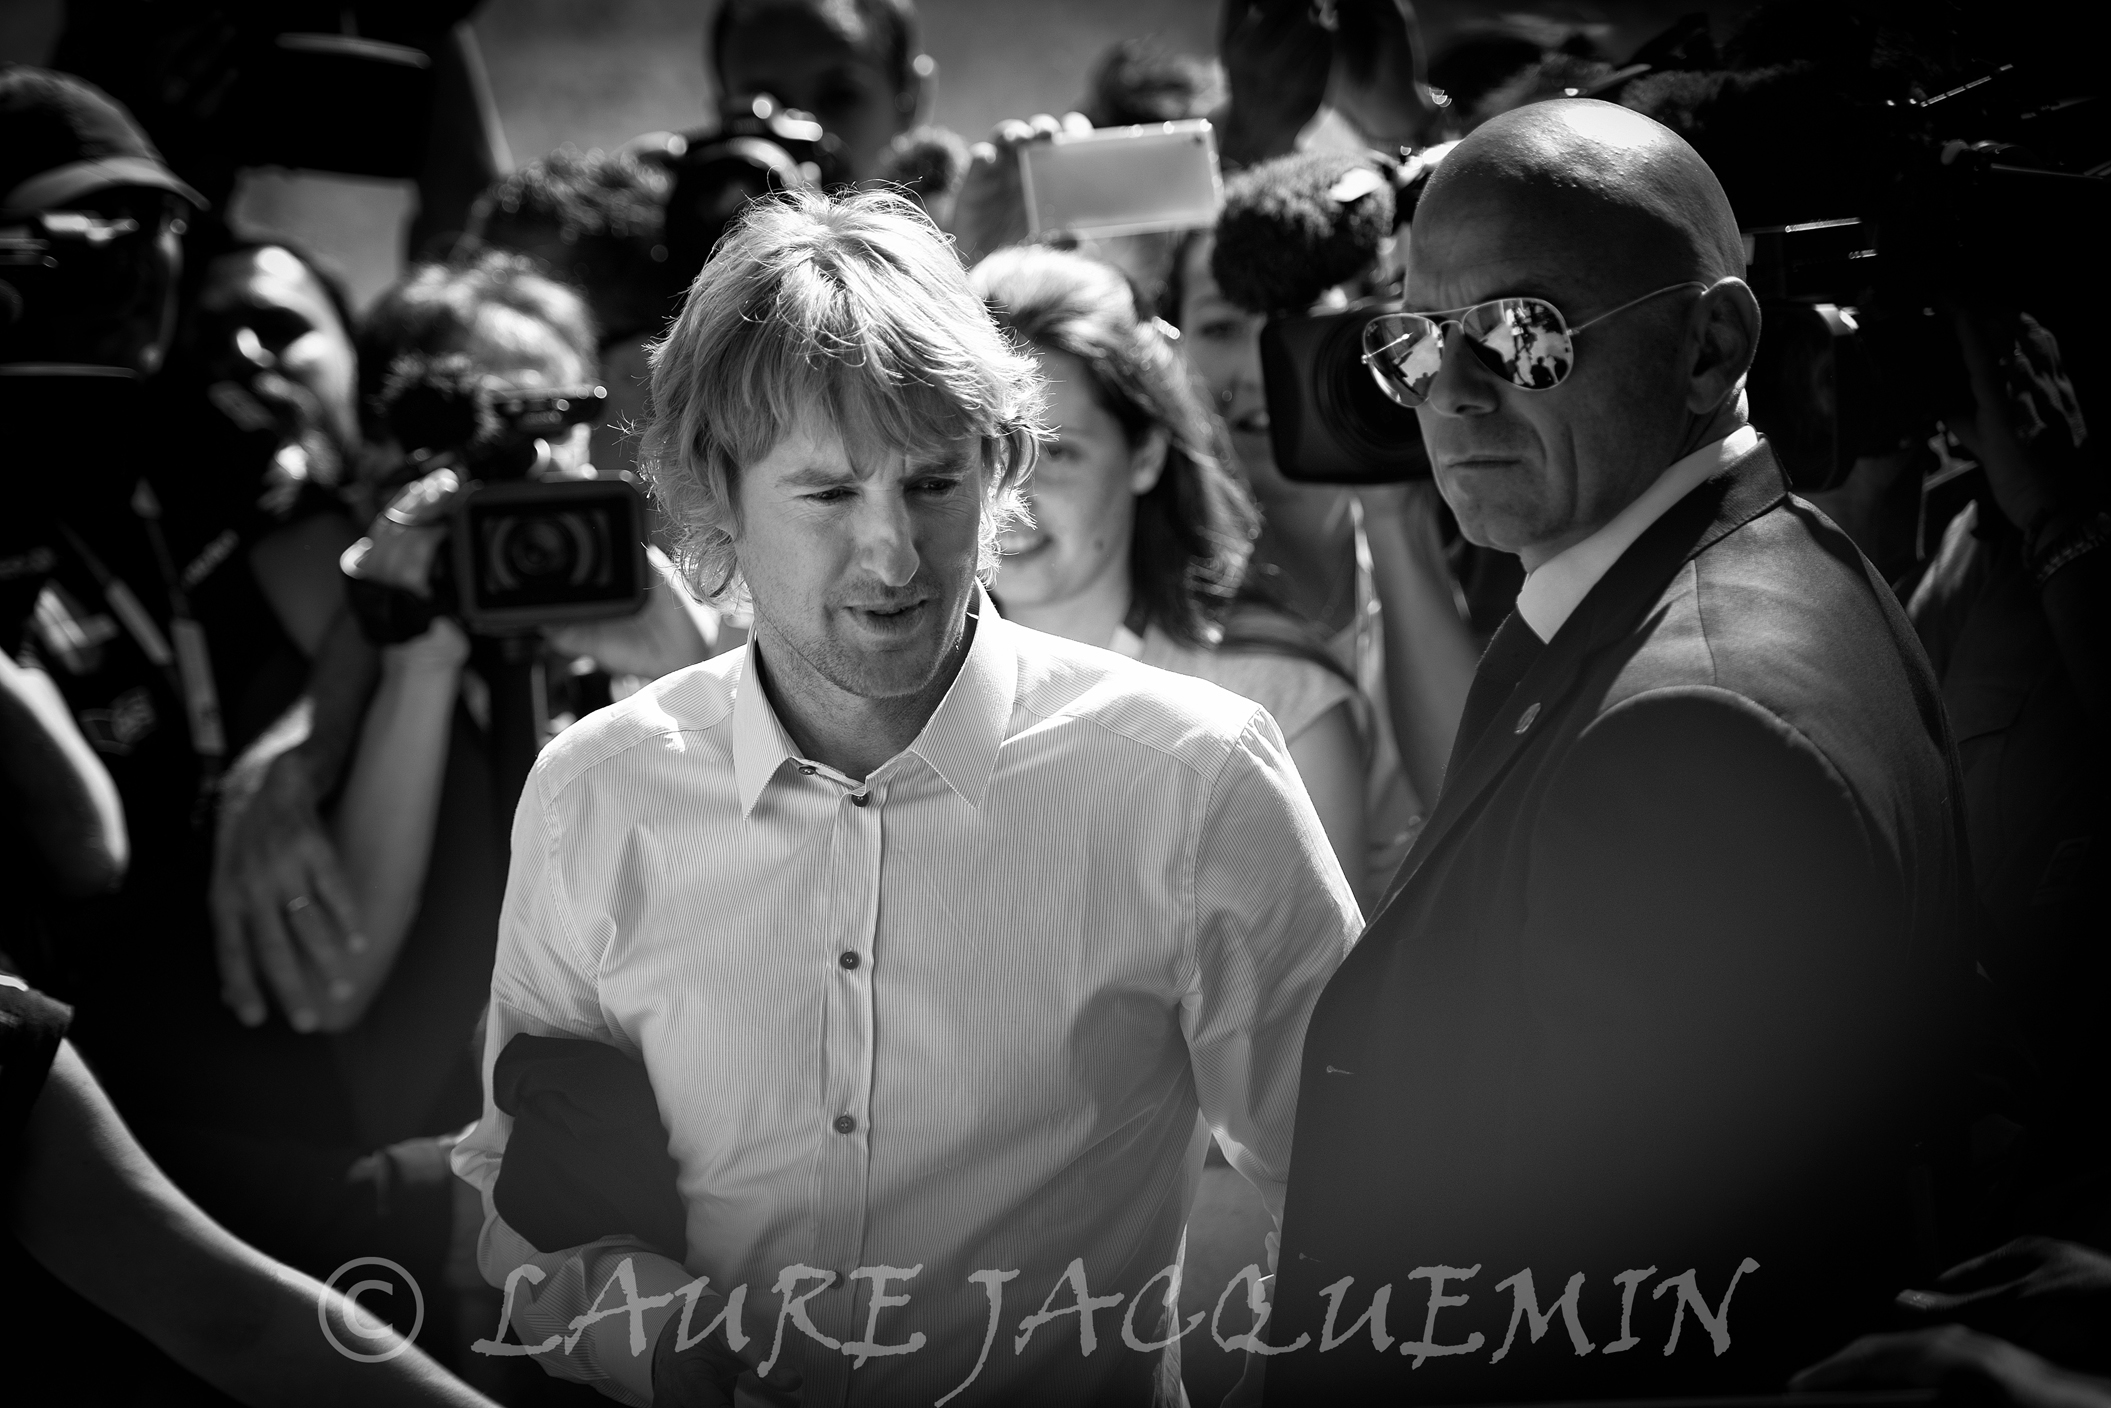 venice film festival venice laure jacquemin (9).jpg